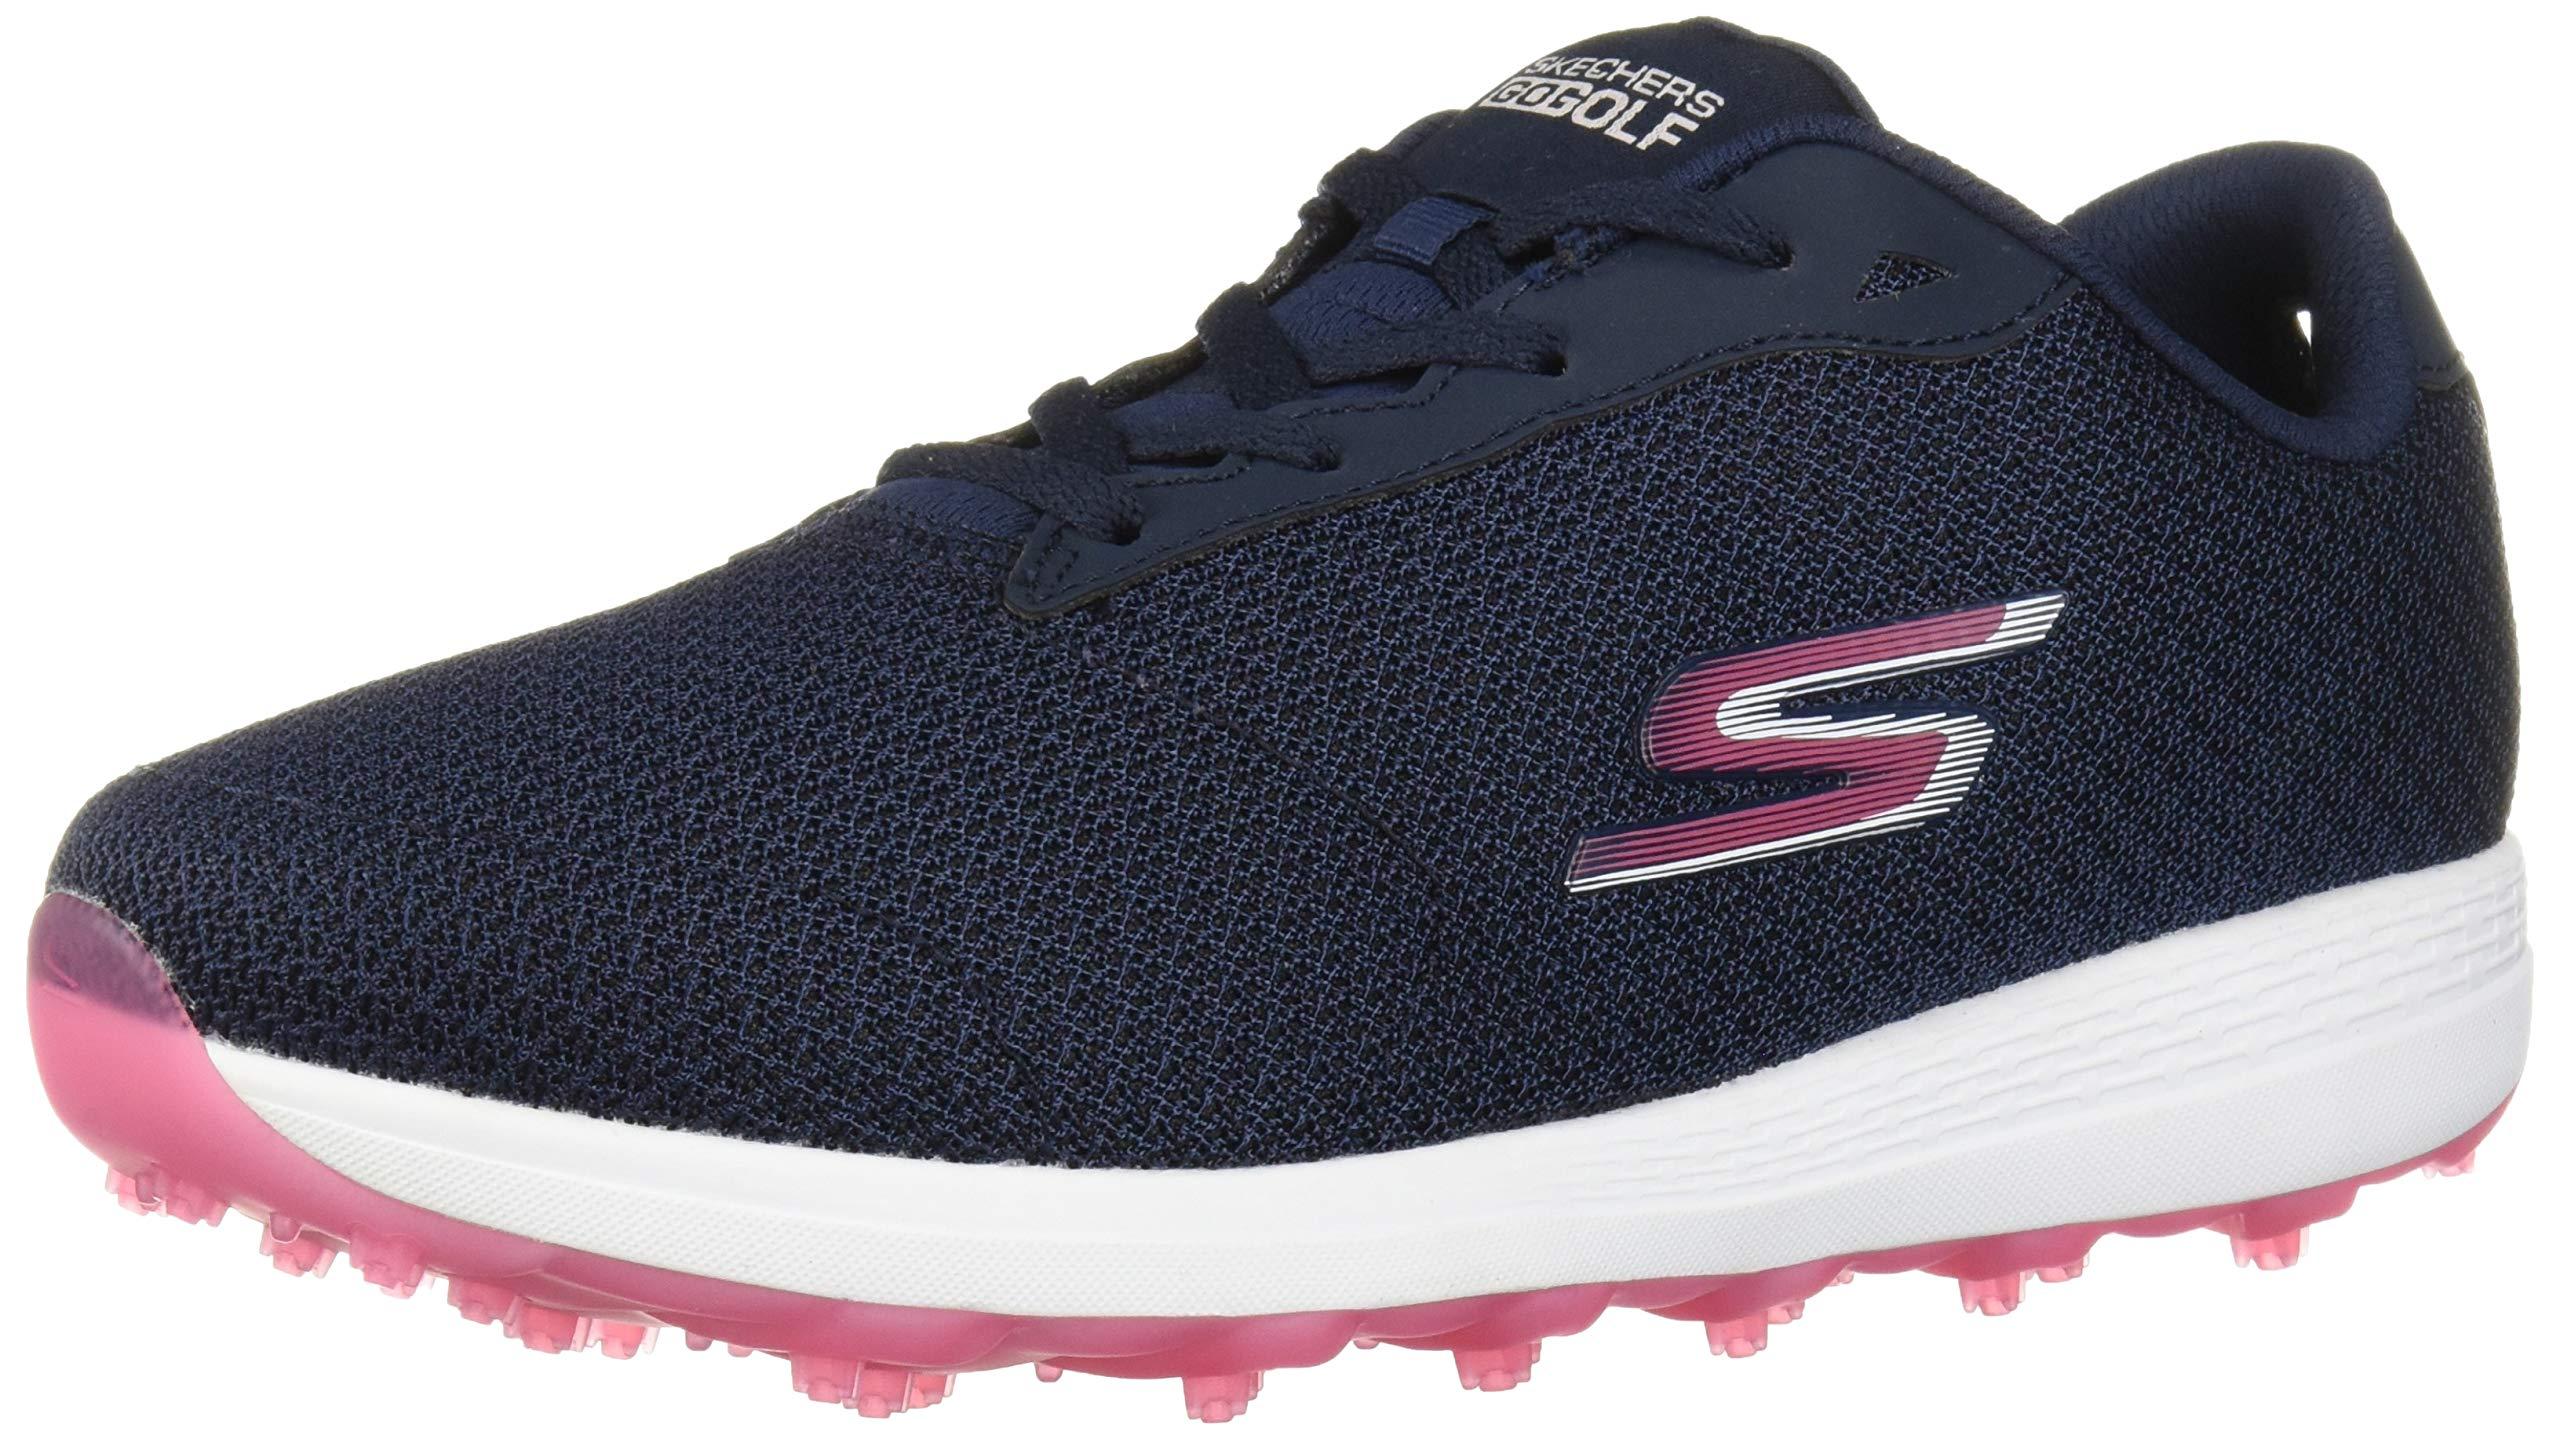 Skechers Women's Max Golf Shoe, Navy/Pink Textile, 5.5 M US